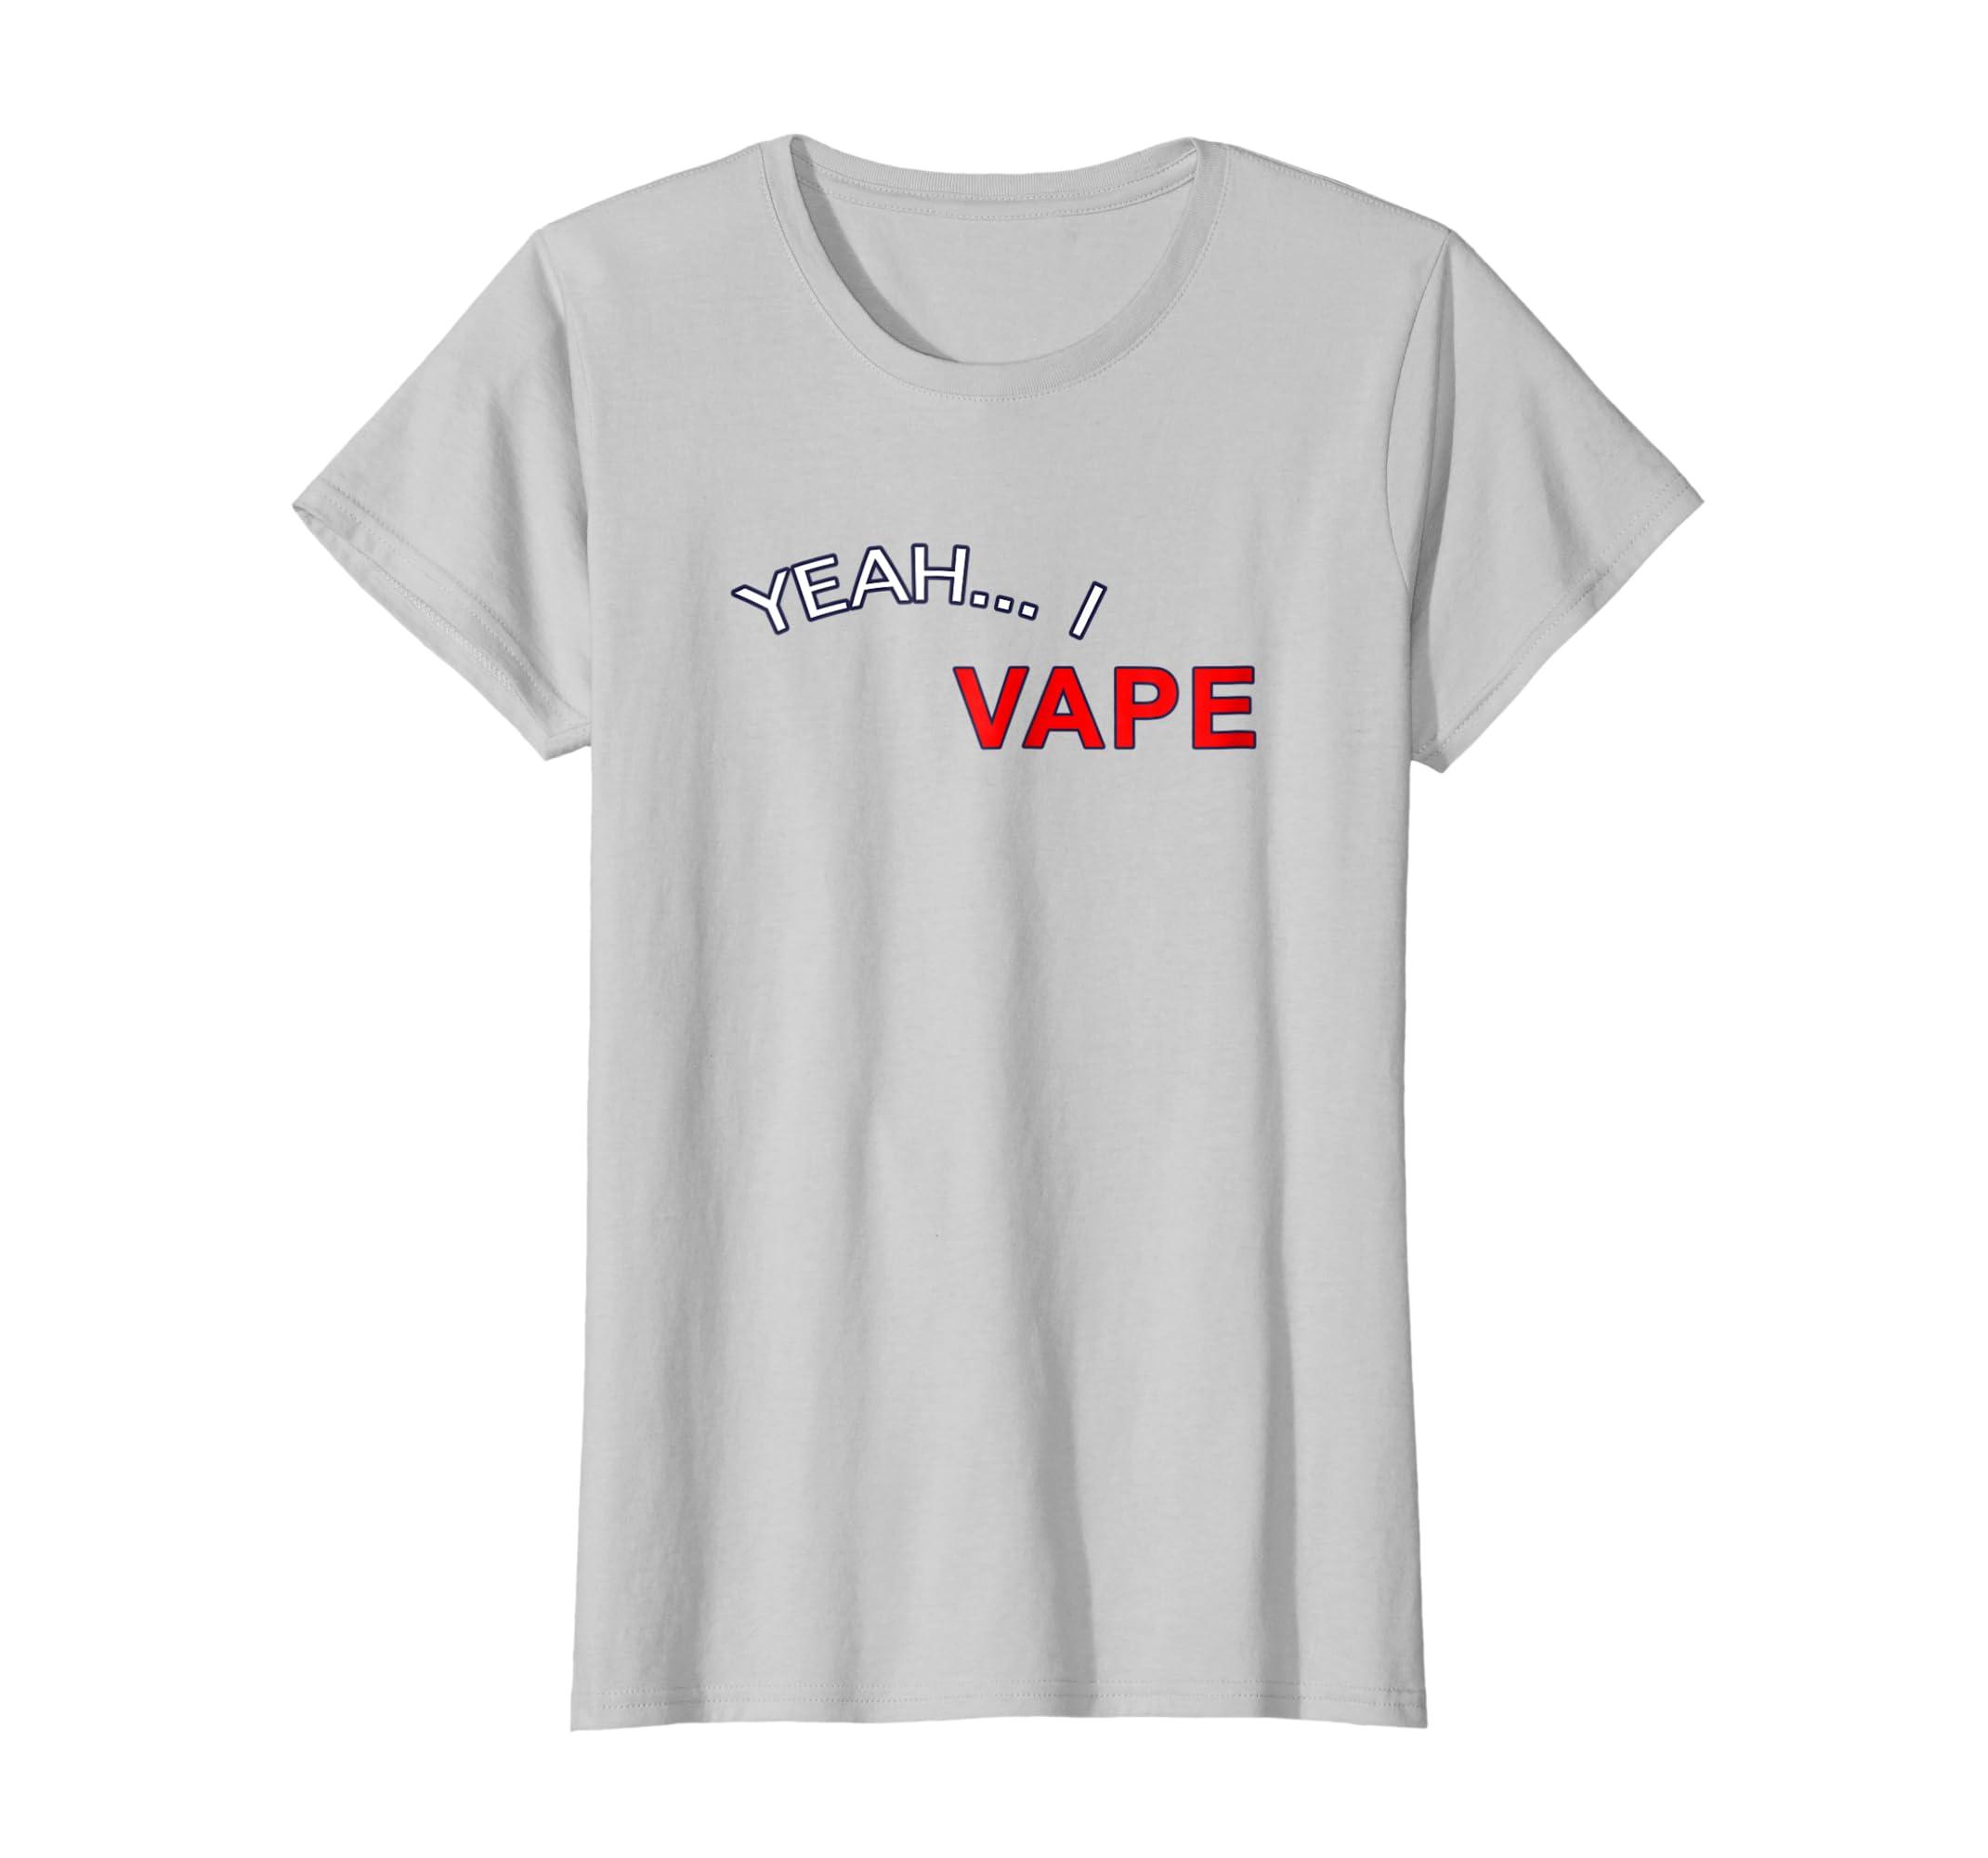 Yeah I Vape Very Good At Respecting Women Shirt-Teesml